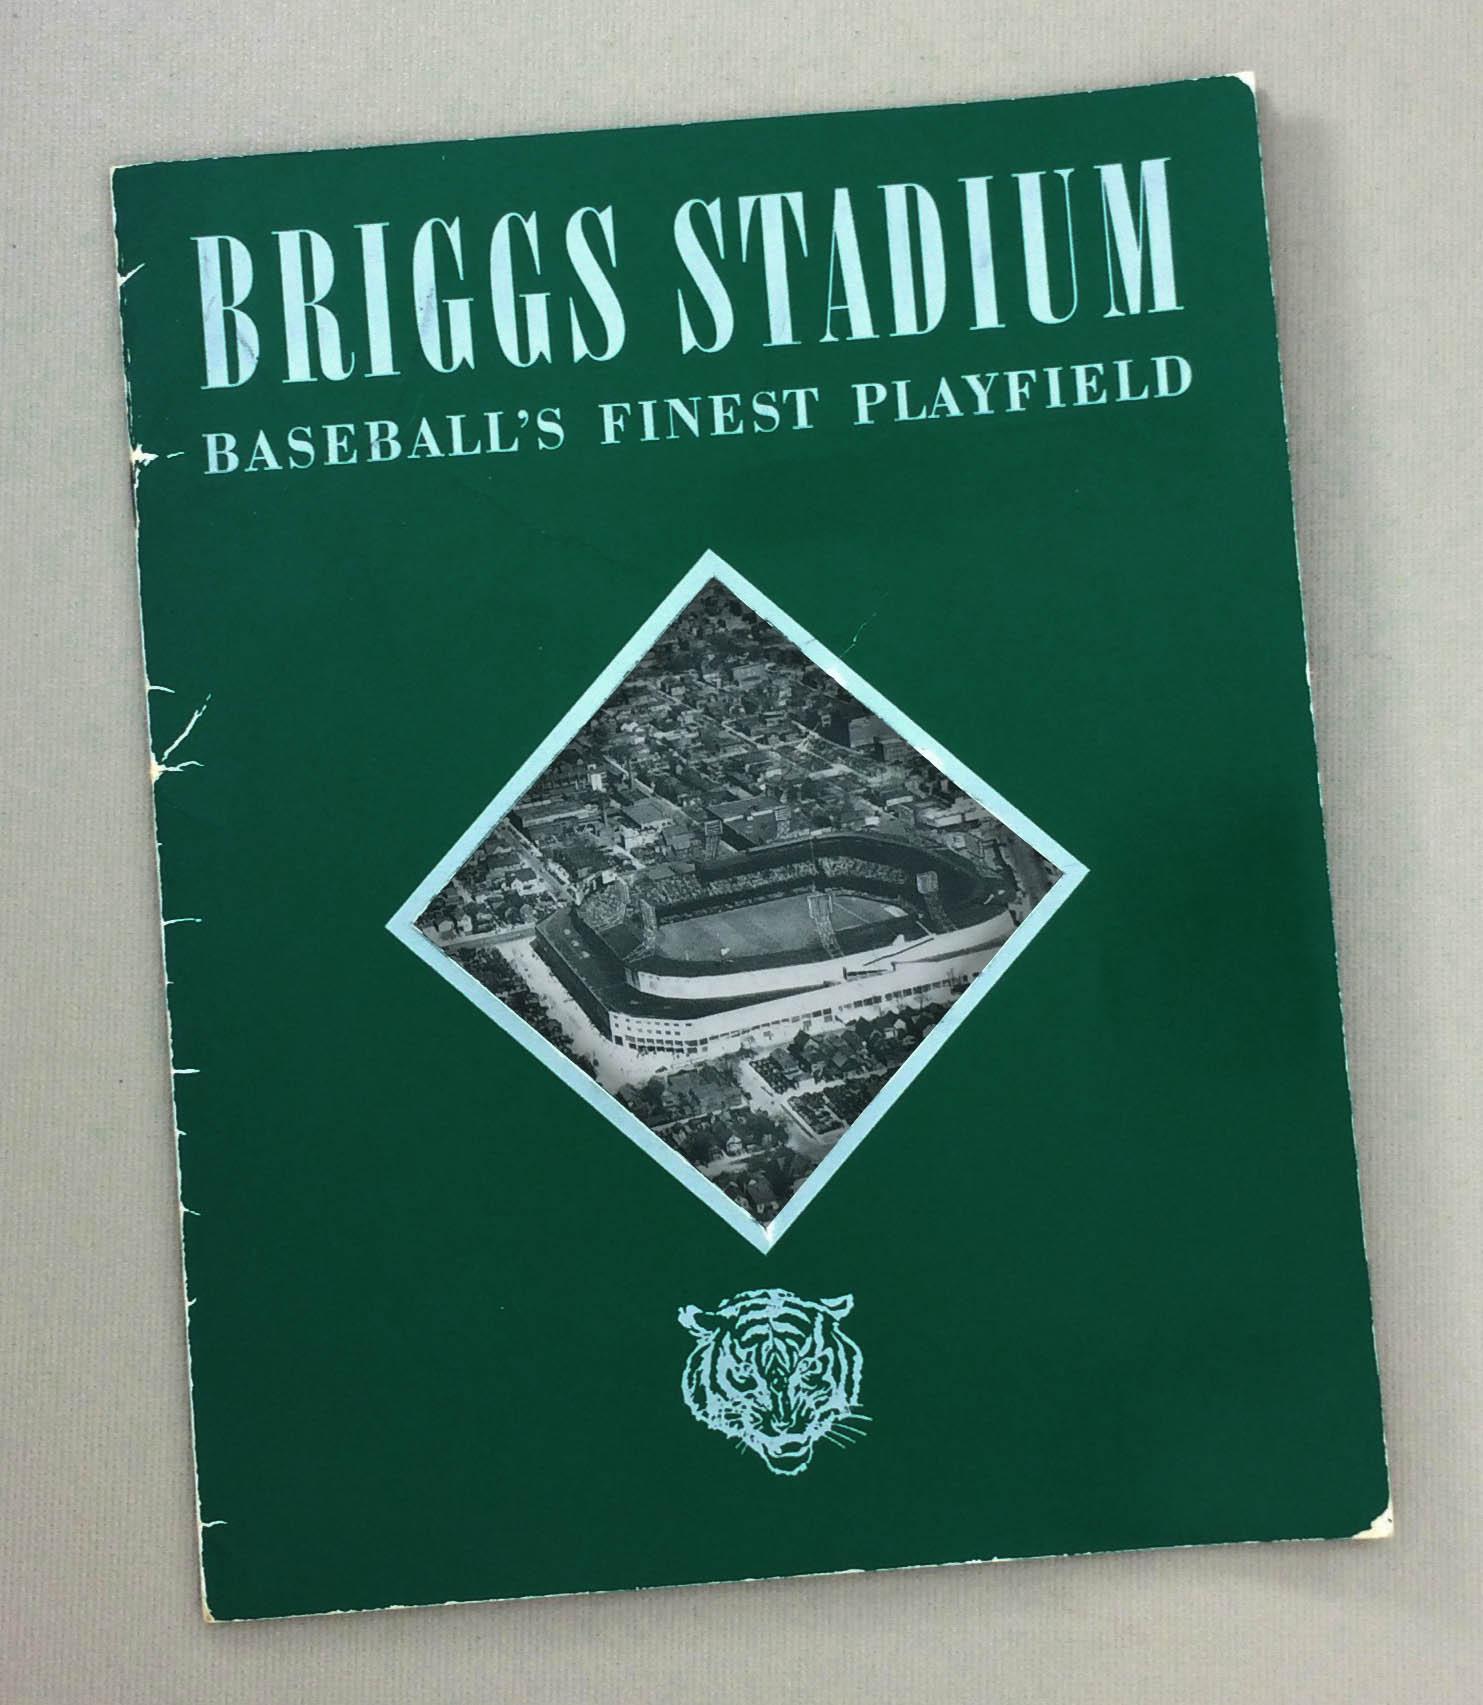 Briggs Stadium Baseball's Finest Playfield